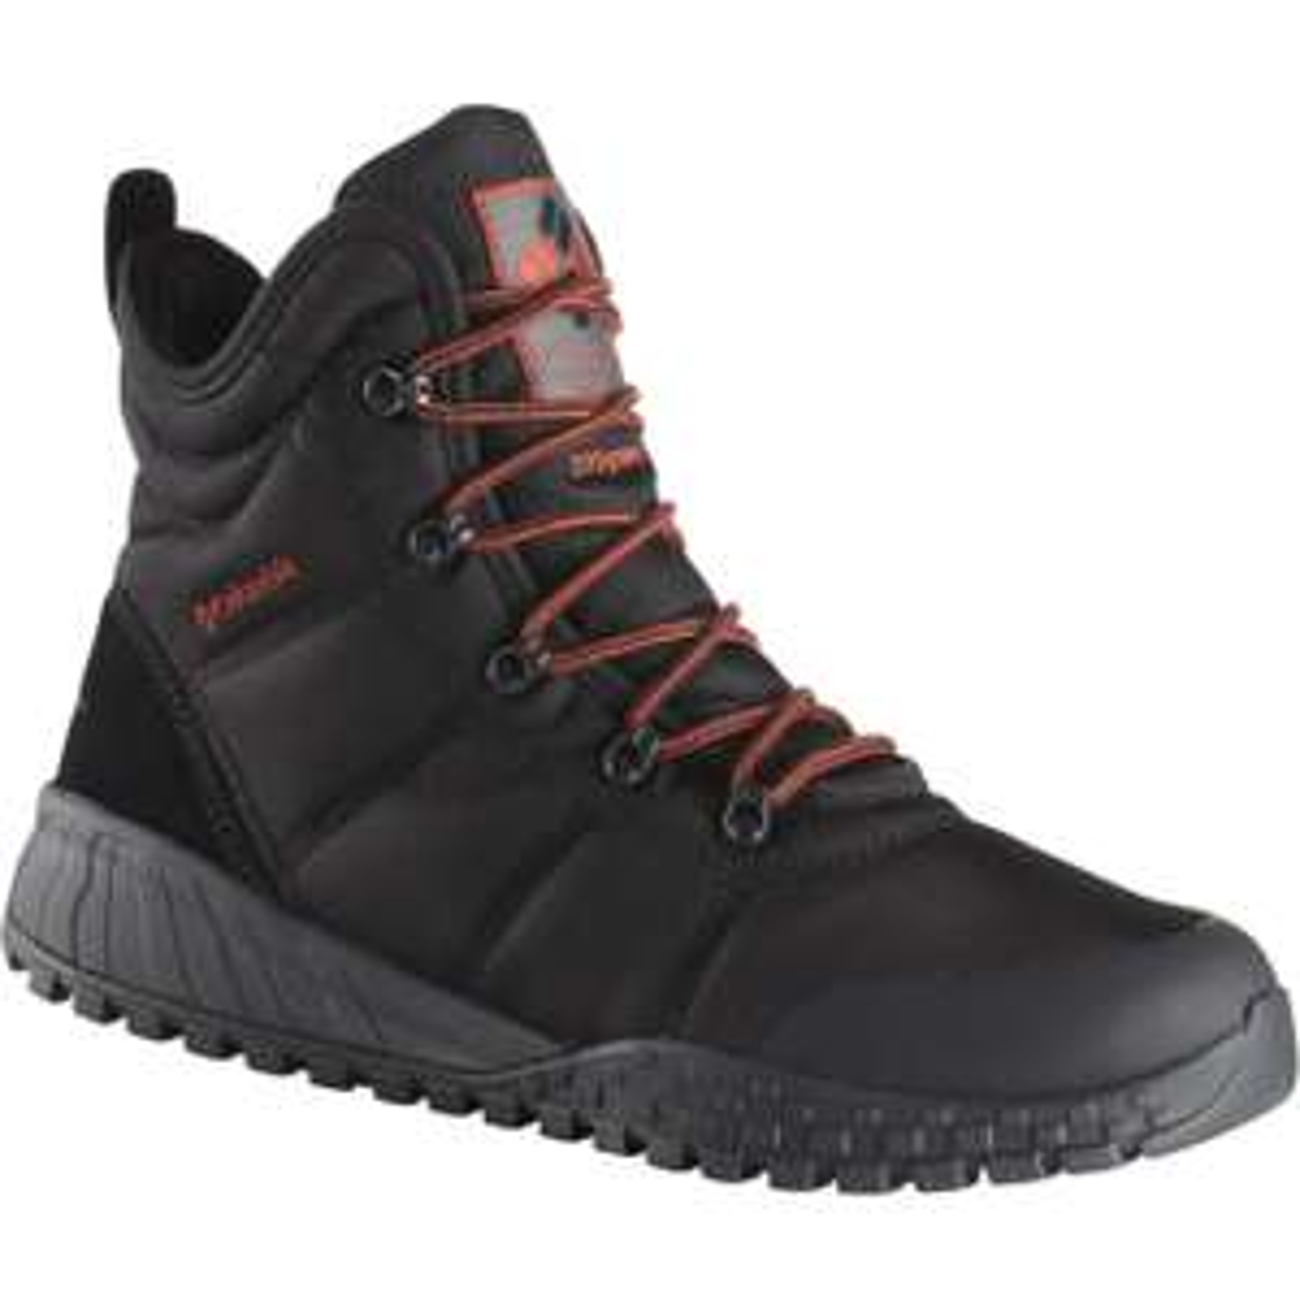 Chaussures homme Columbia Fairbanks Omni-heat